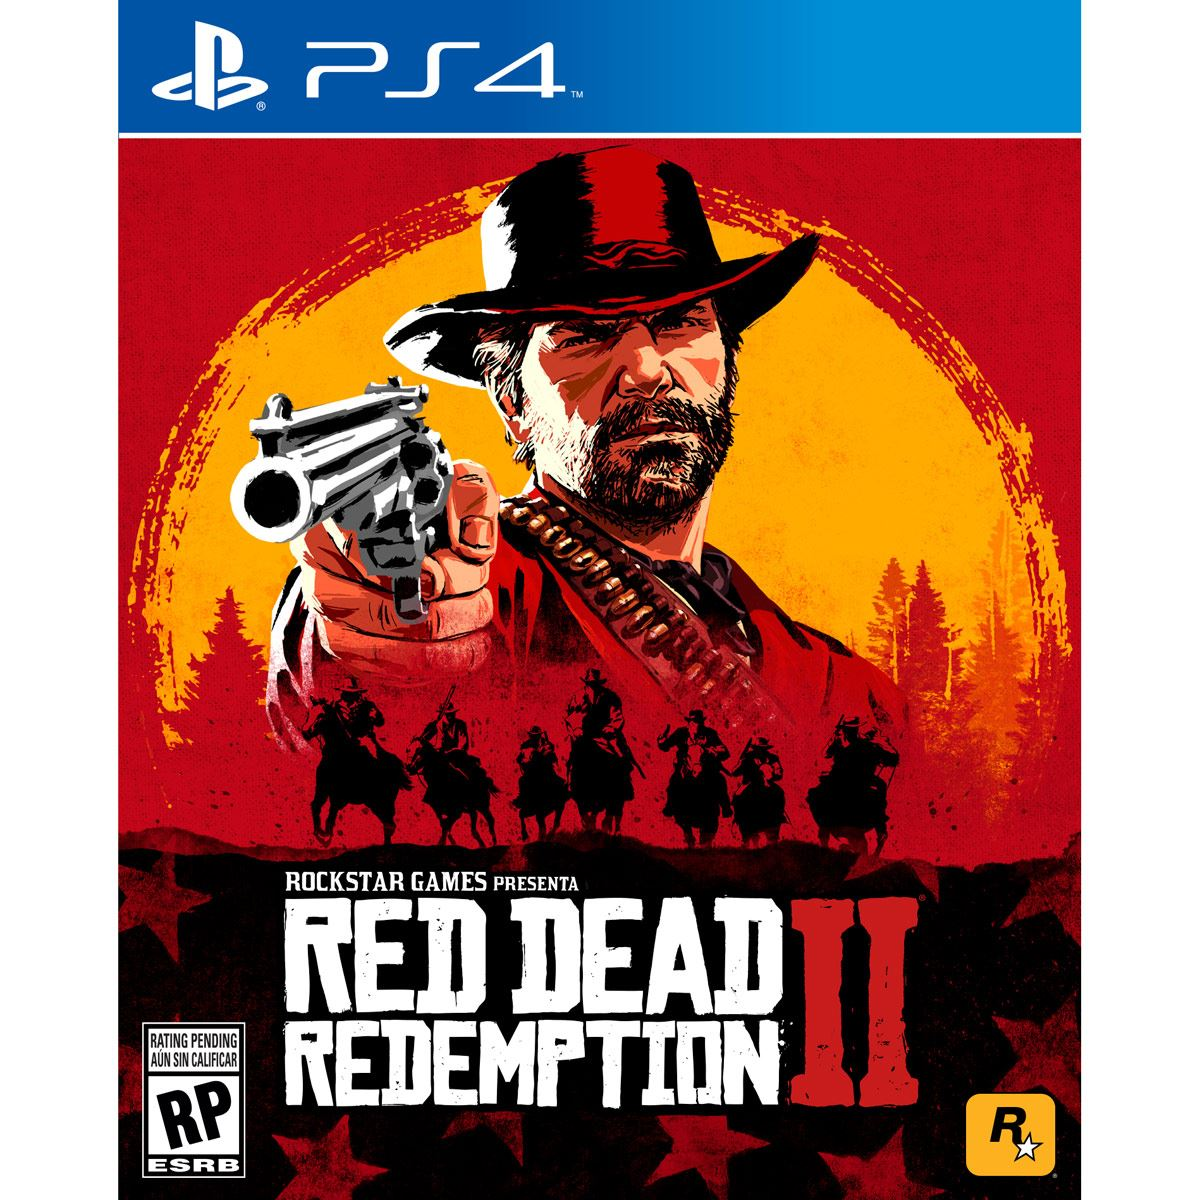 Ps4 red dead redemption 2  - Sanborns